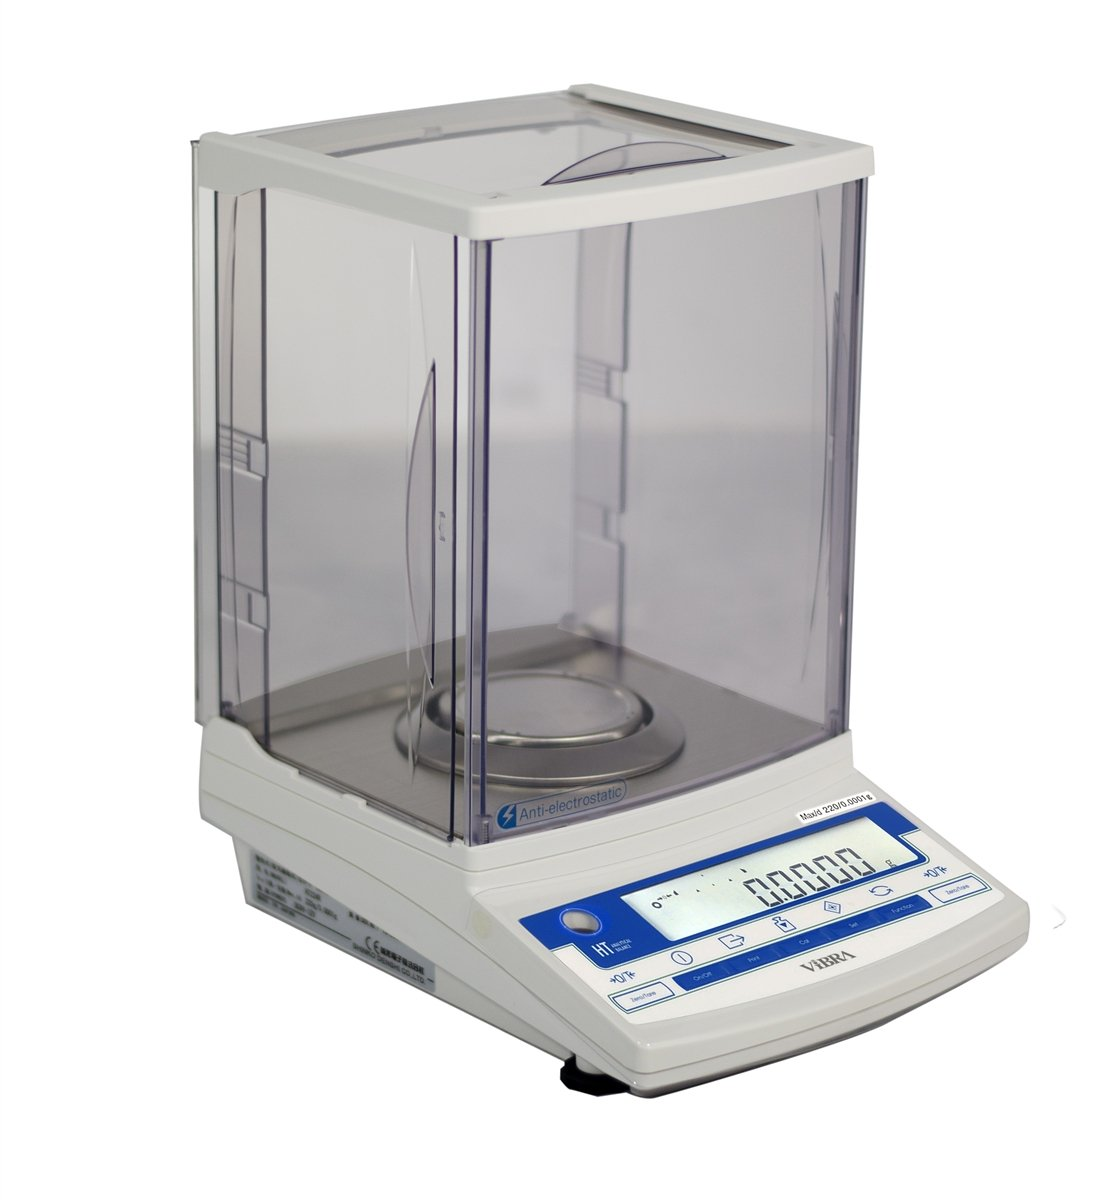 Intell-Lab HT-224 Analytical Balance: Amazon.com: Industrial & Scientific